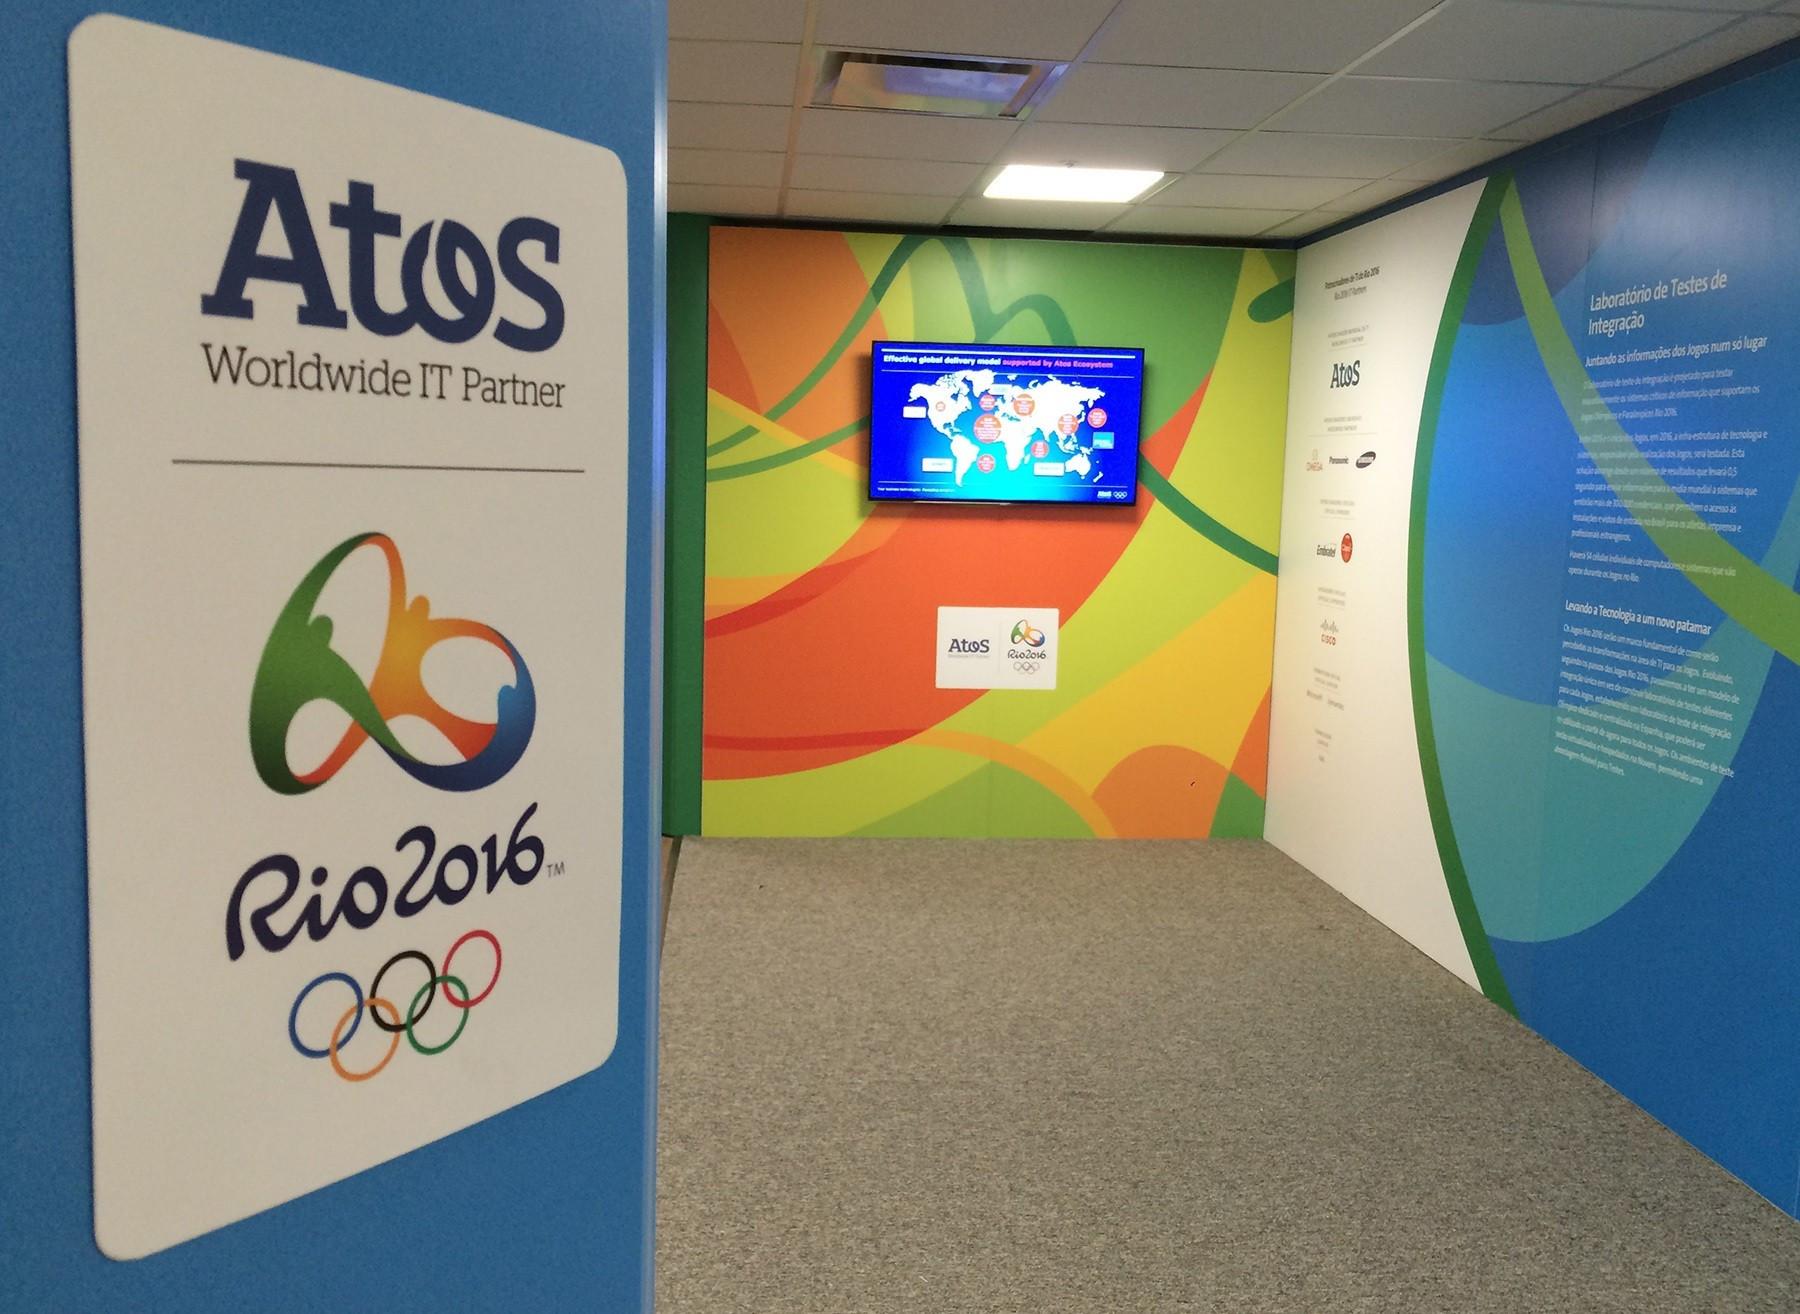 Atos opens Rio 2016 IT integration testing lab